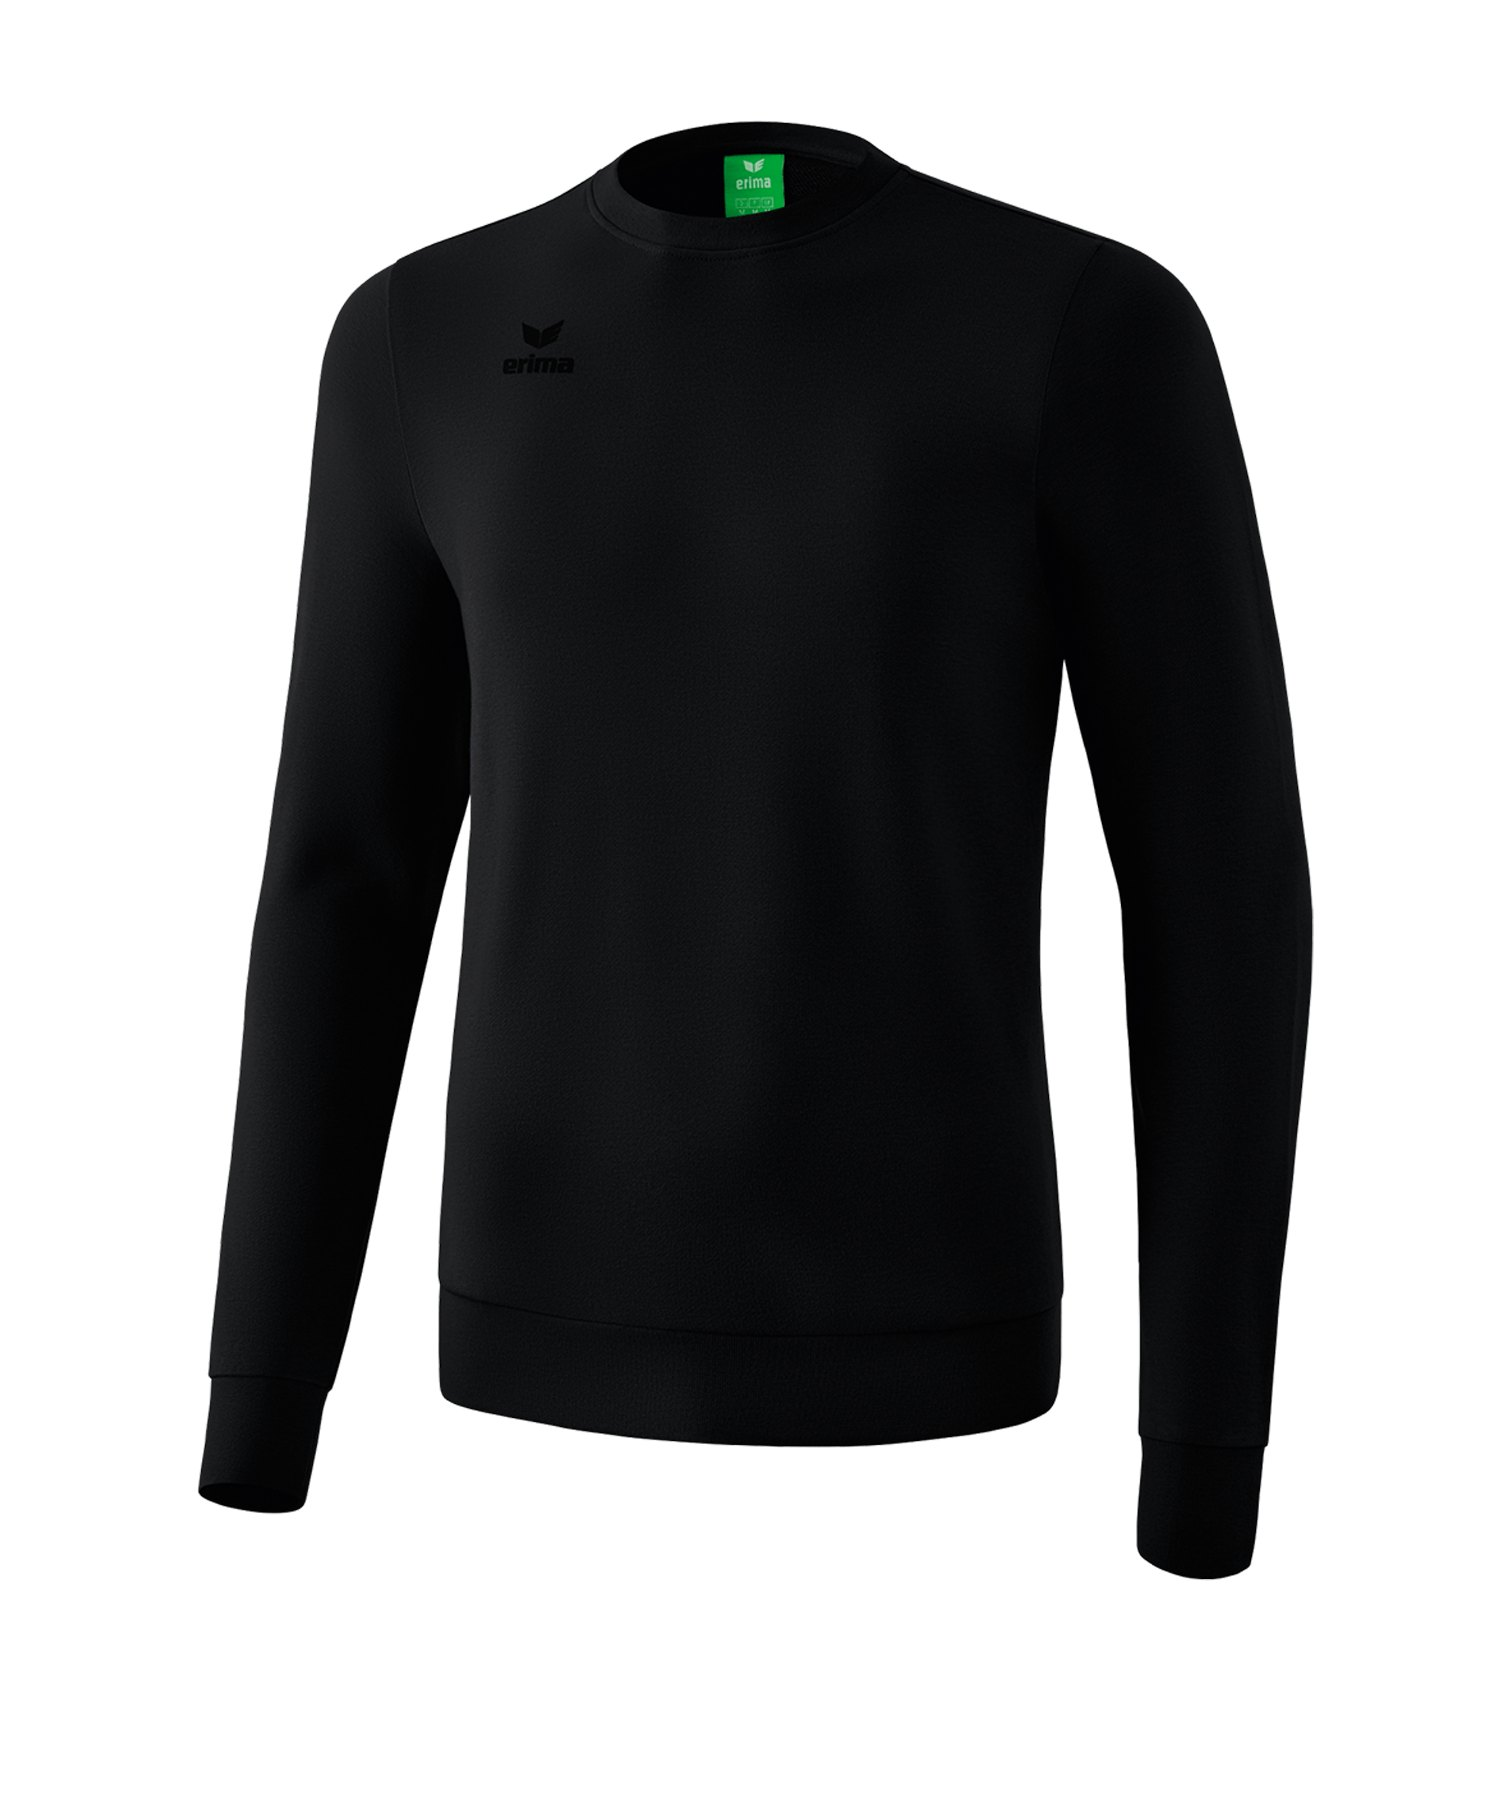 Erima Basic Sweatshirt Kids Schwarz - schwarz